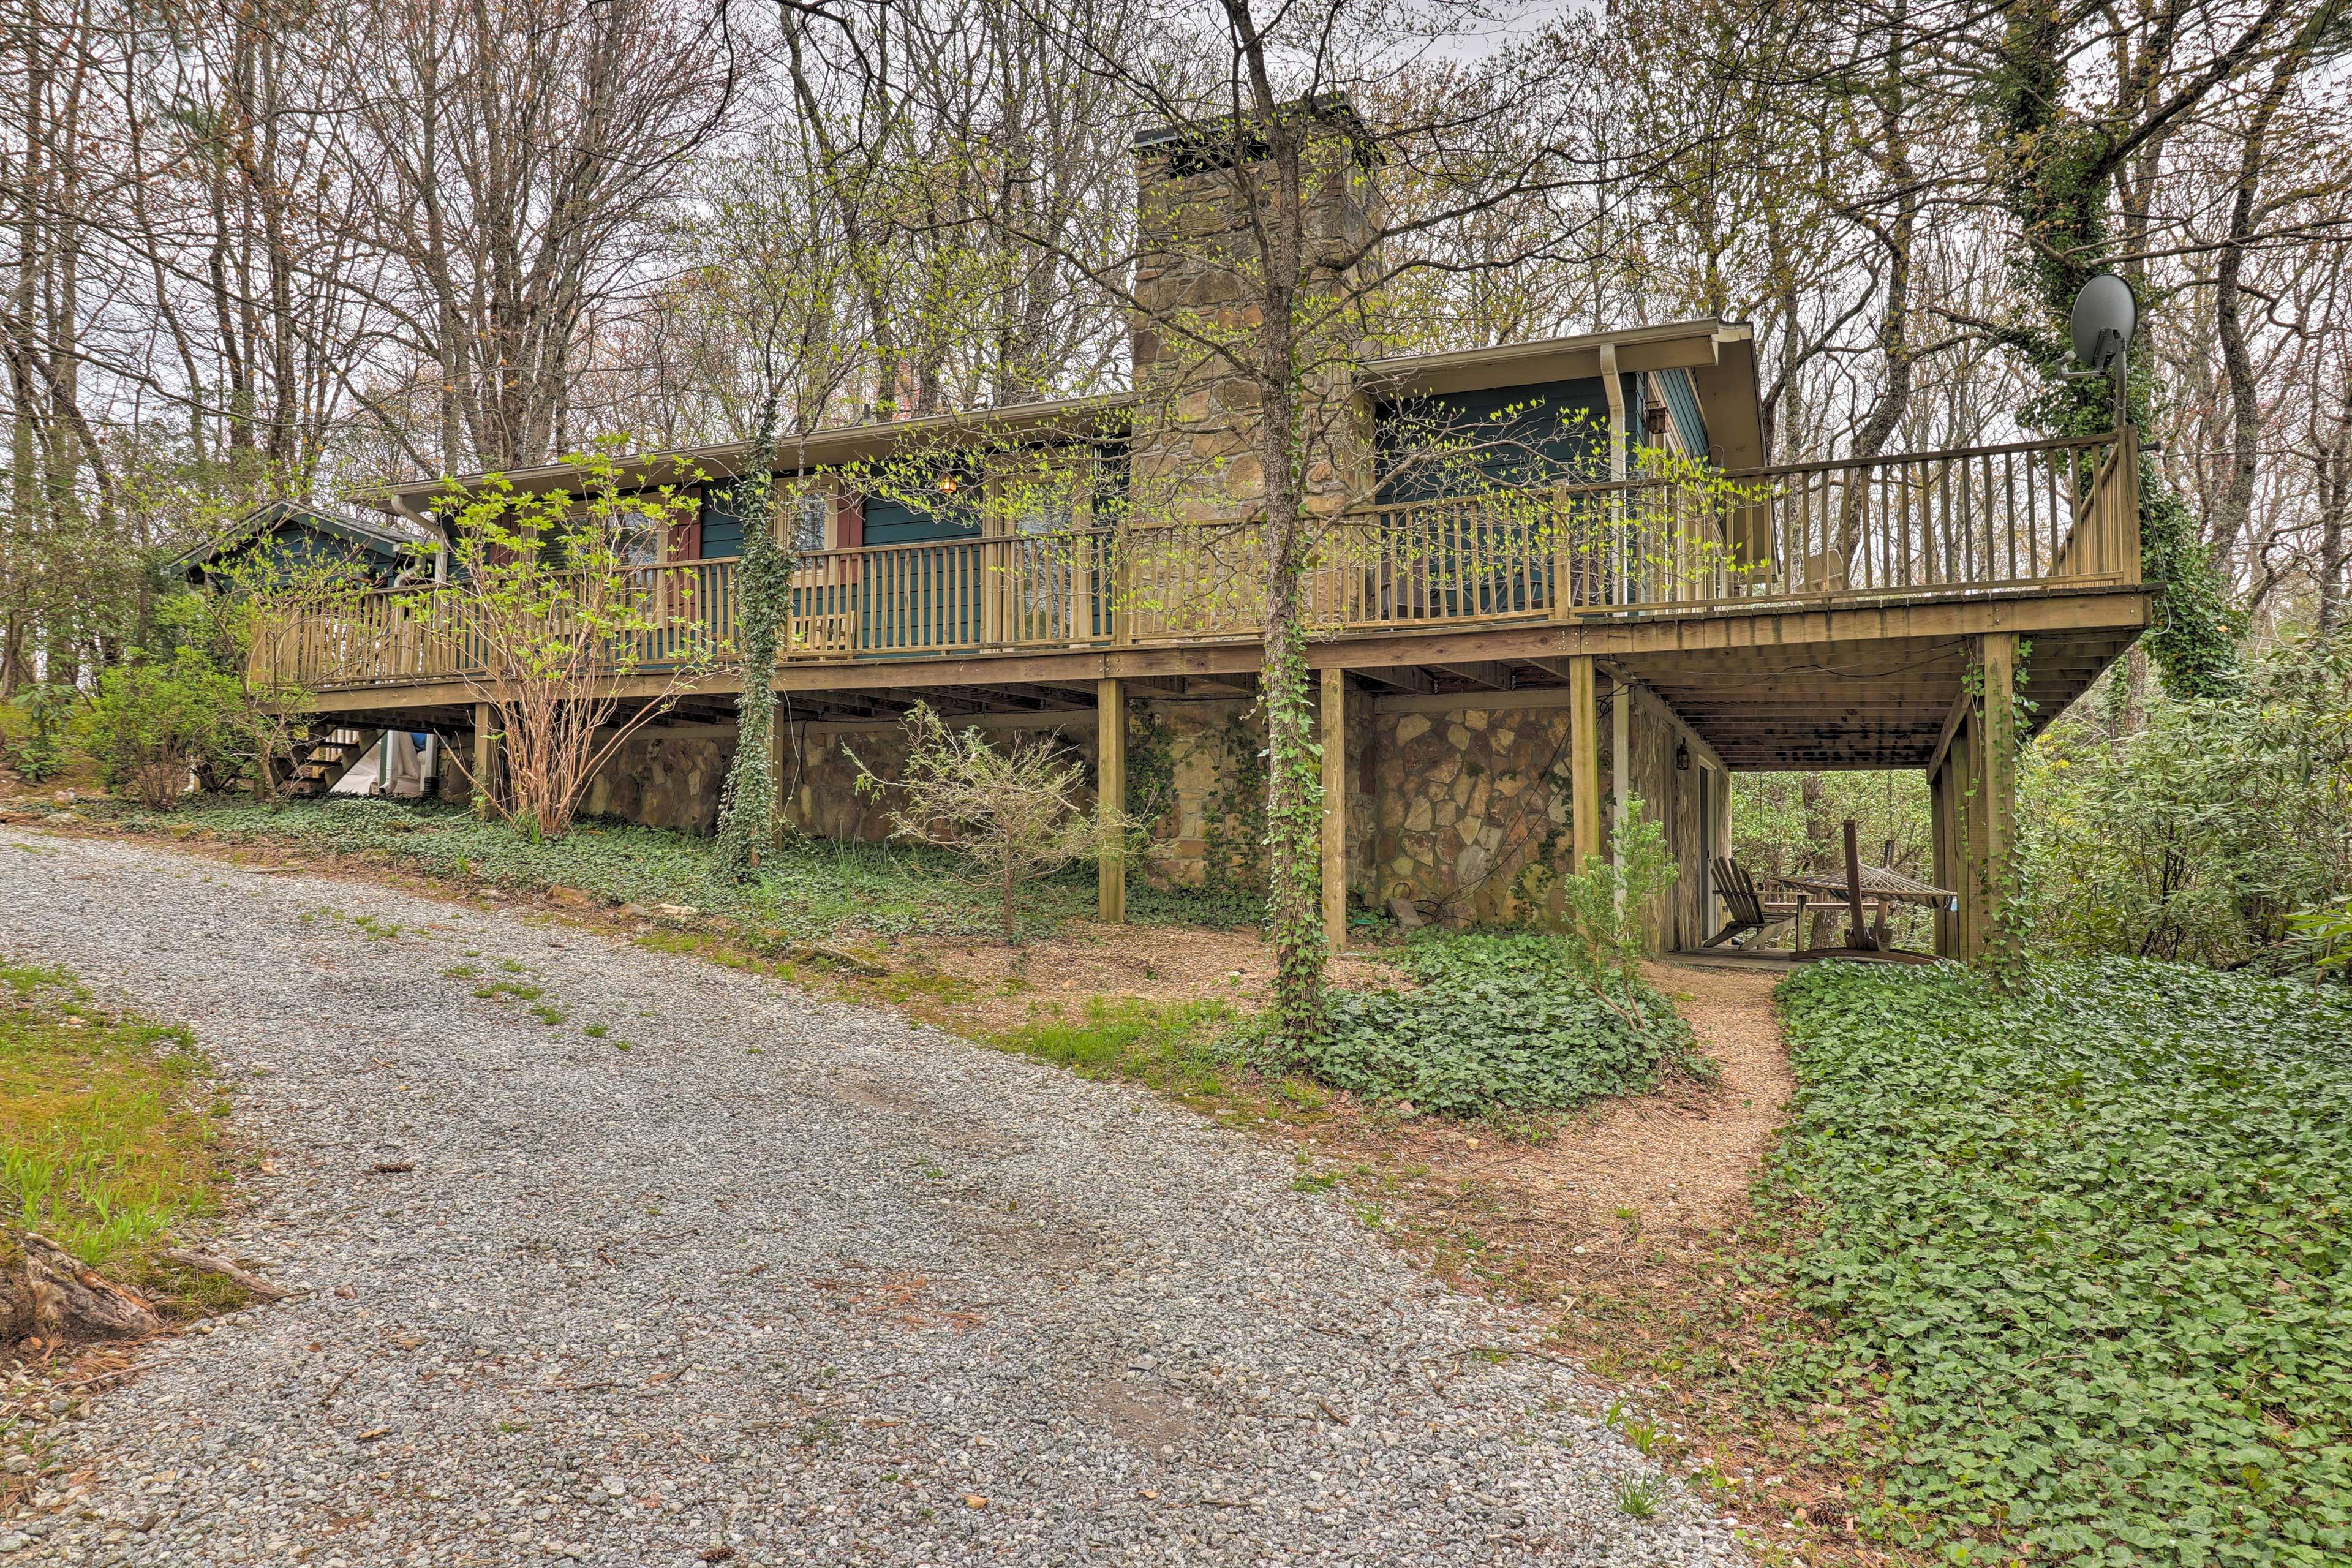 Exterior   Wraparound Deck   Lower-Level Patio   Natural Surroundings